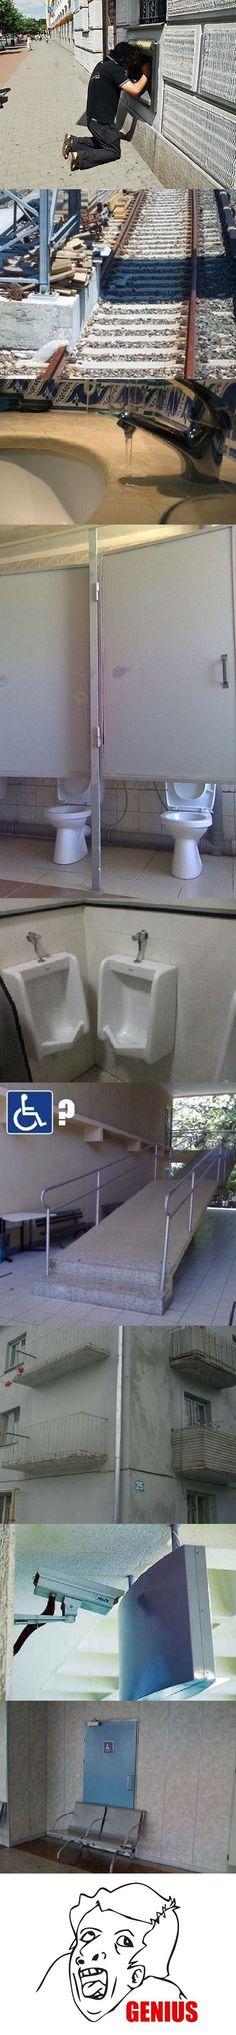 Genius, in a trolling kind of way...